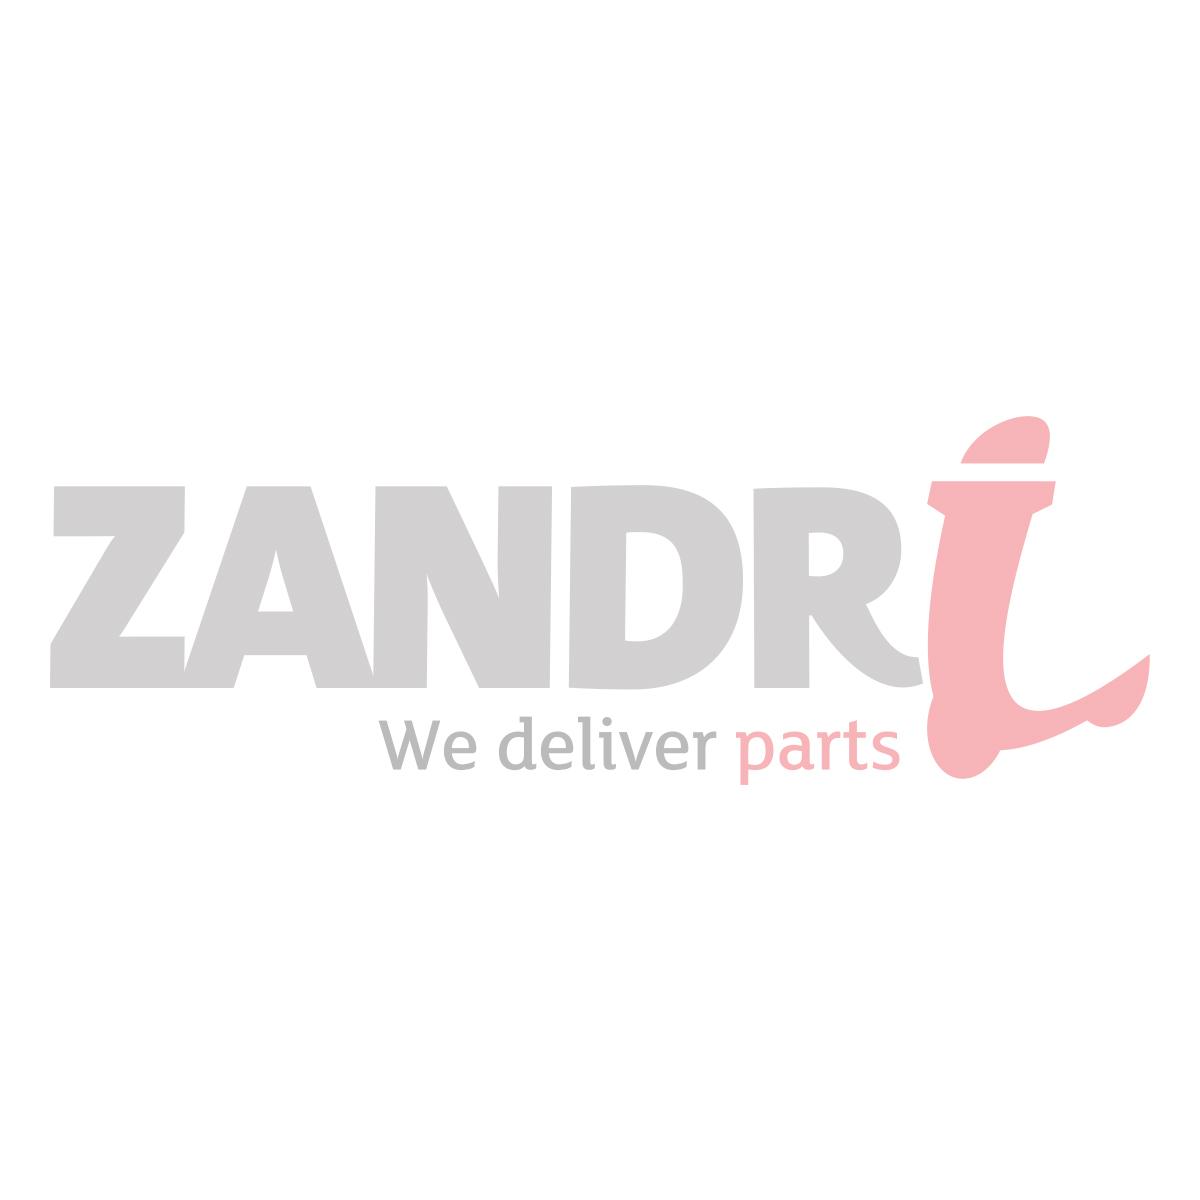 Buddy / Zadelslot China Filly origineel 77235-kbg-9000